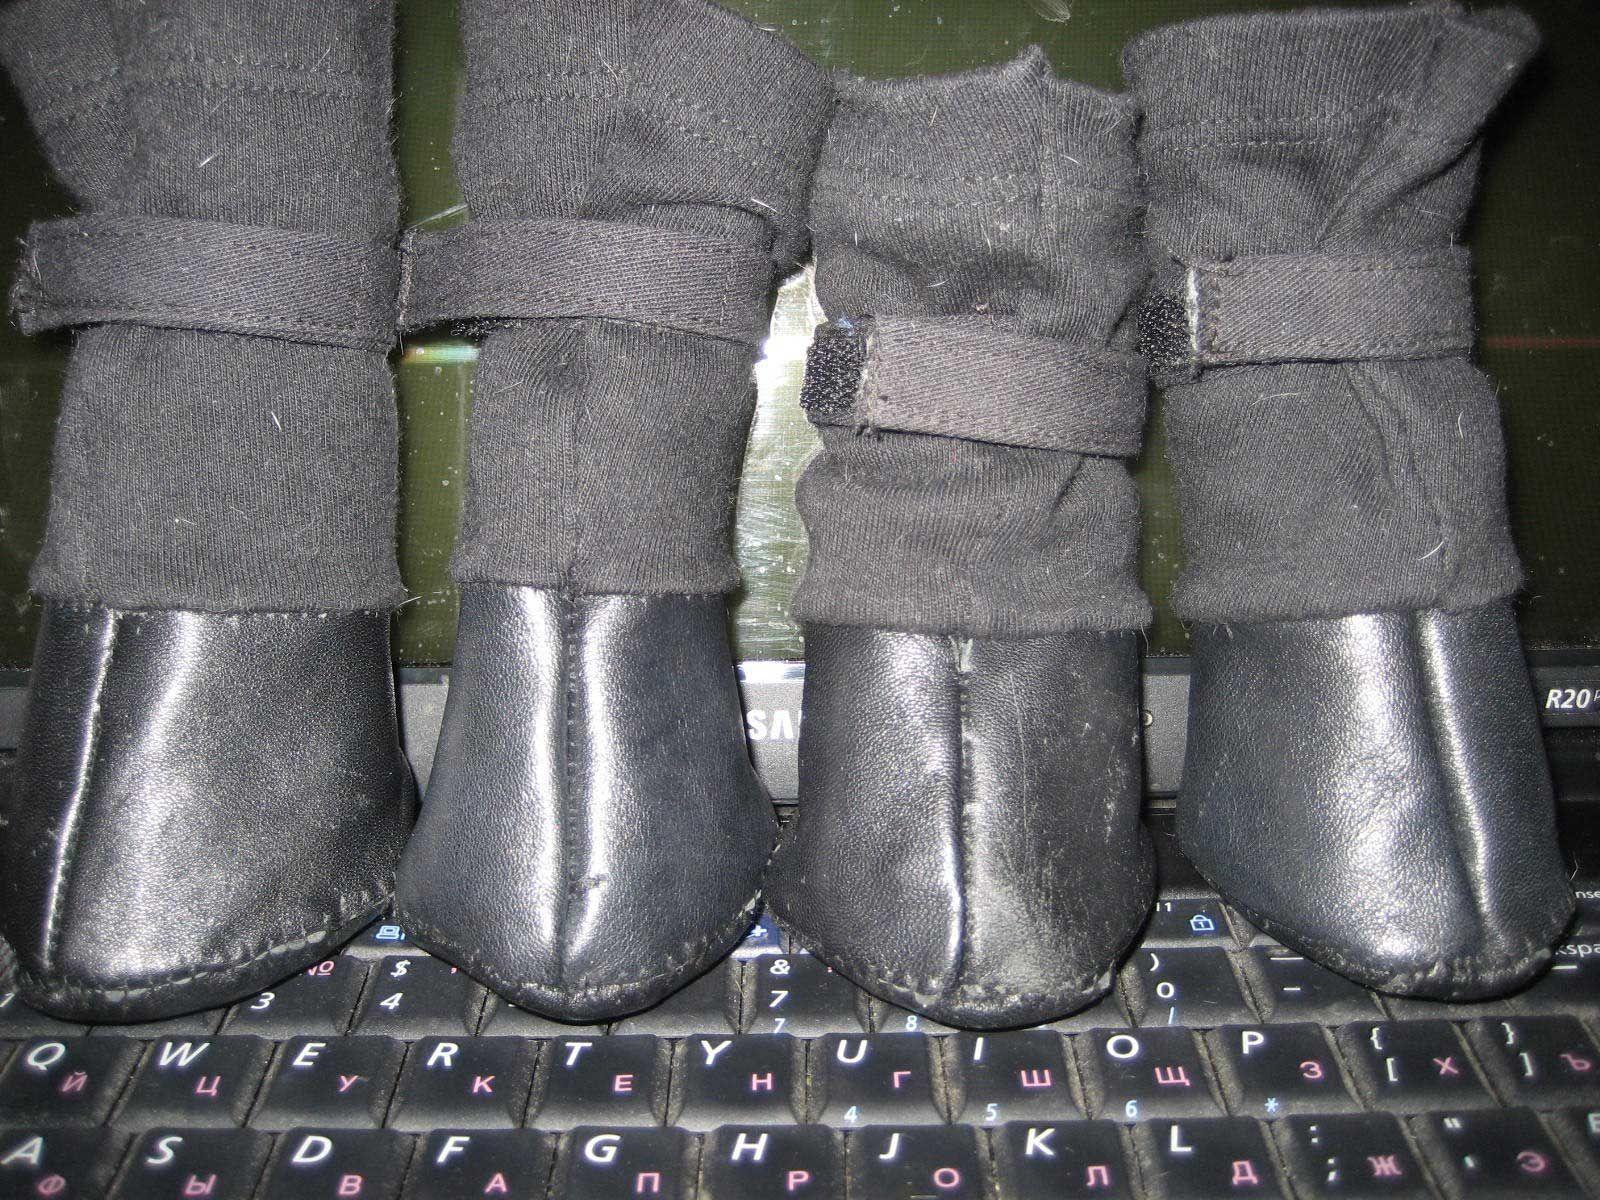 обувь для собак сапожки для собак » Как пошить сапожки для собаки  дома, своими  руками 4a2aaab4b9e